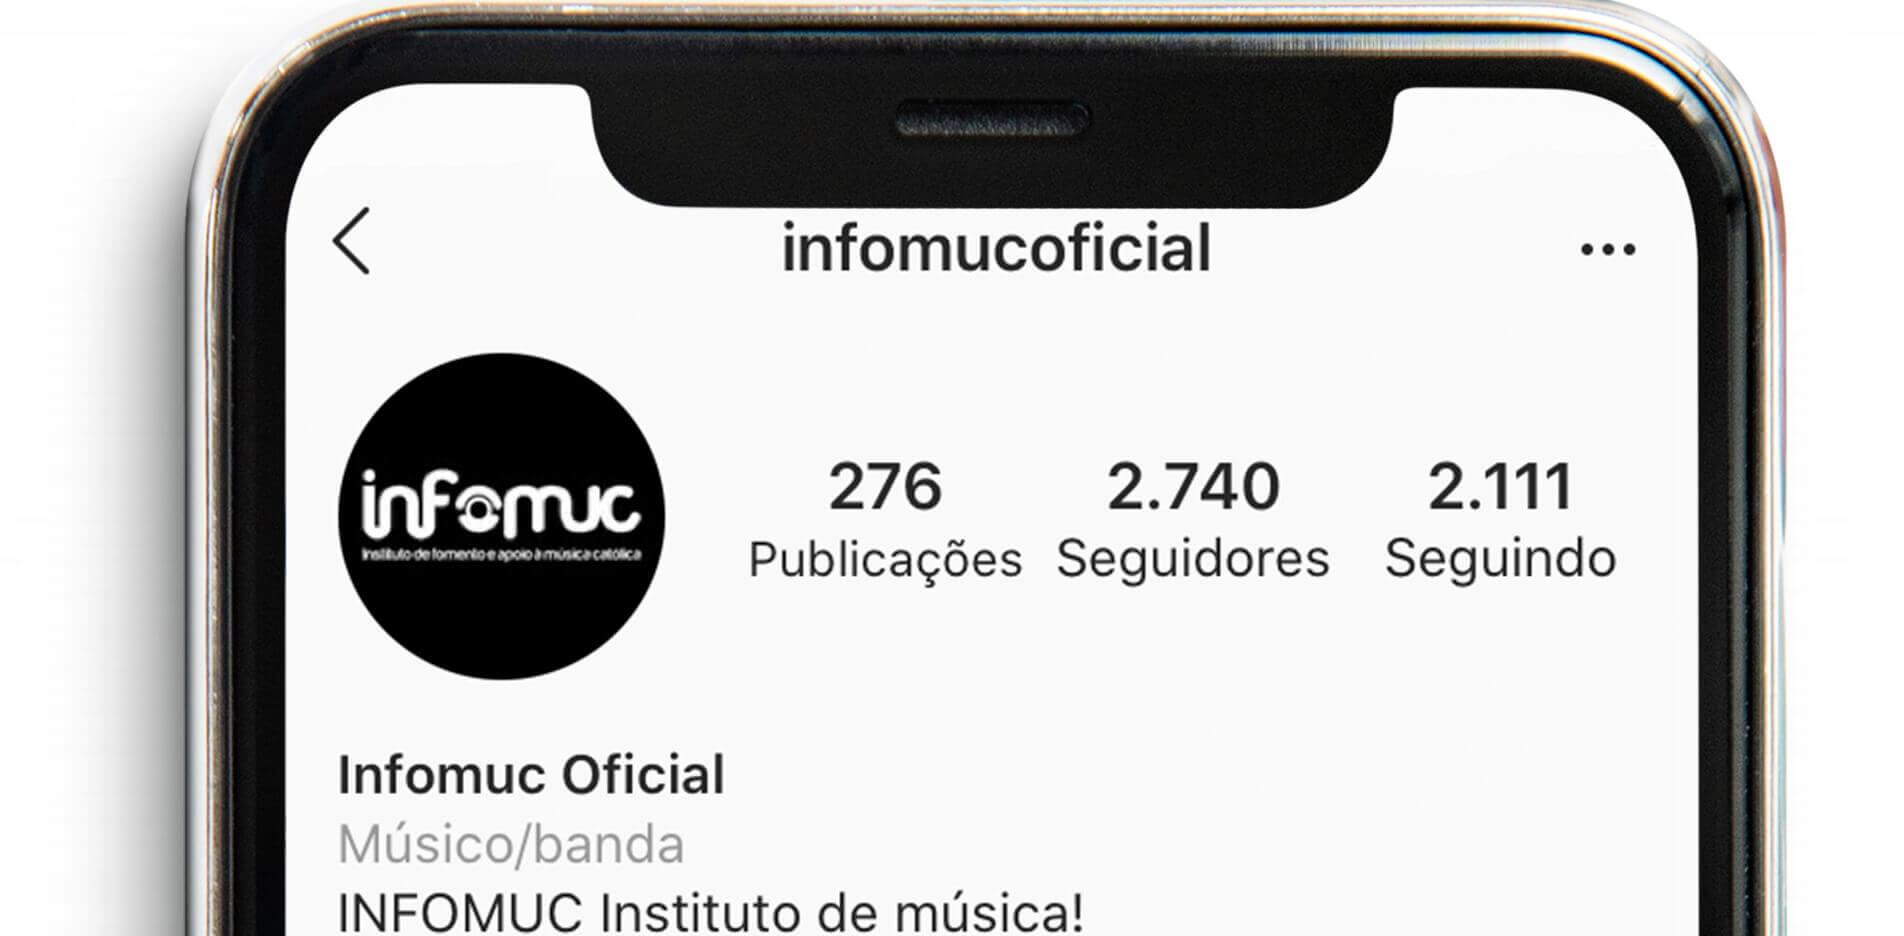 infomuc